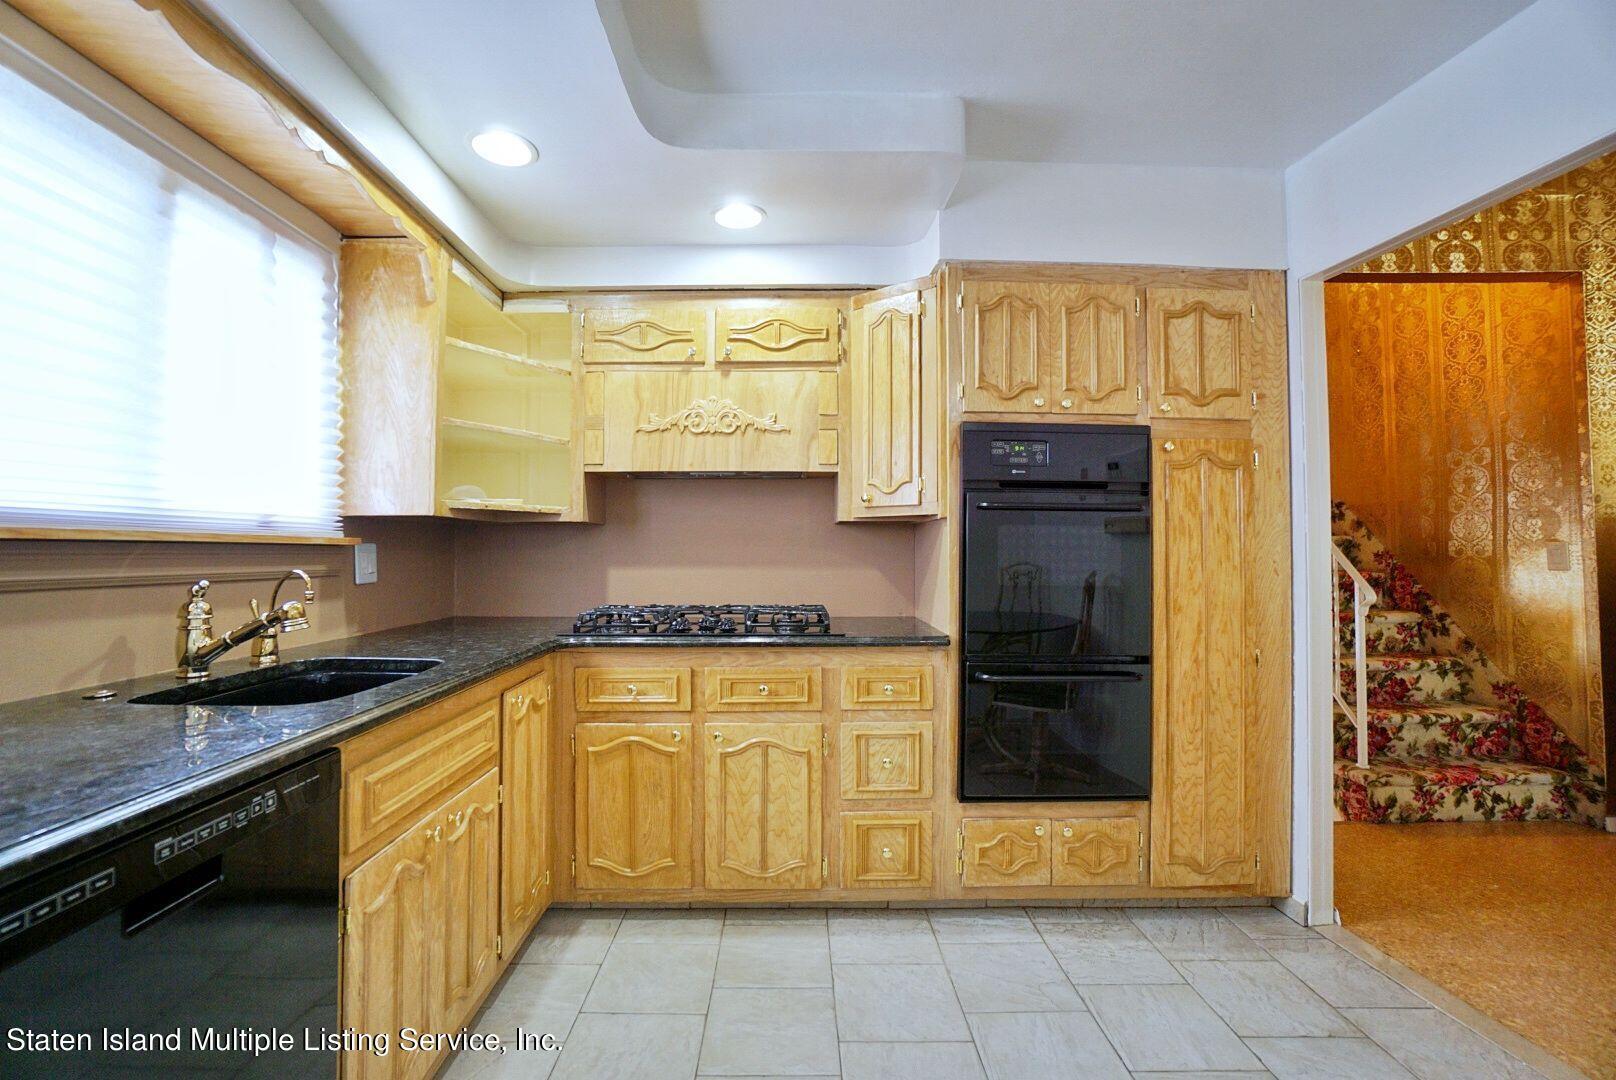 Single Family - Detached 94 Cranford Avenue  Staten Island, NY 10306, MLS-1146620-15